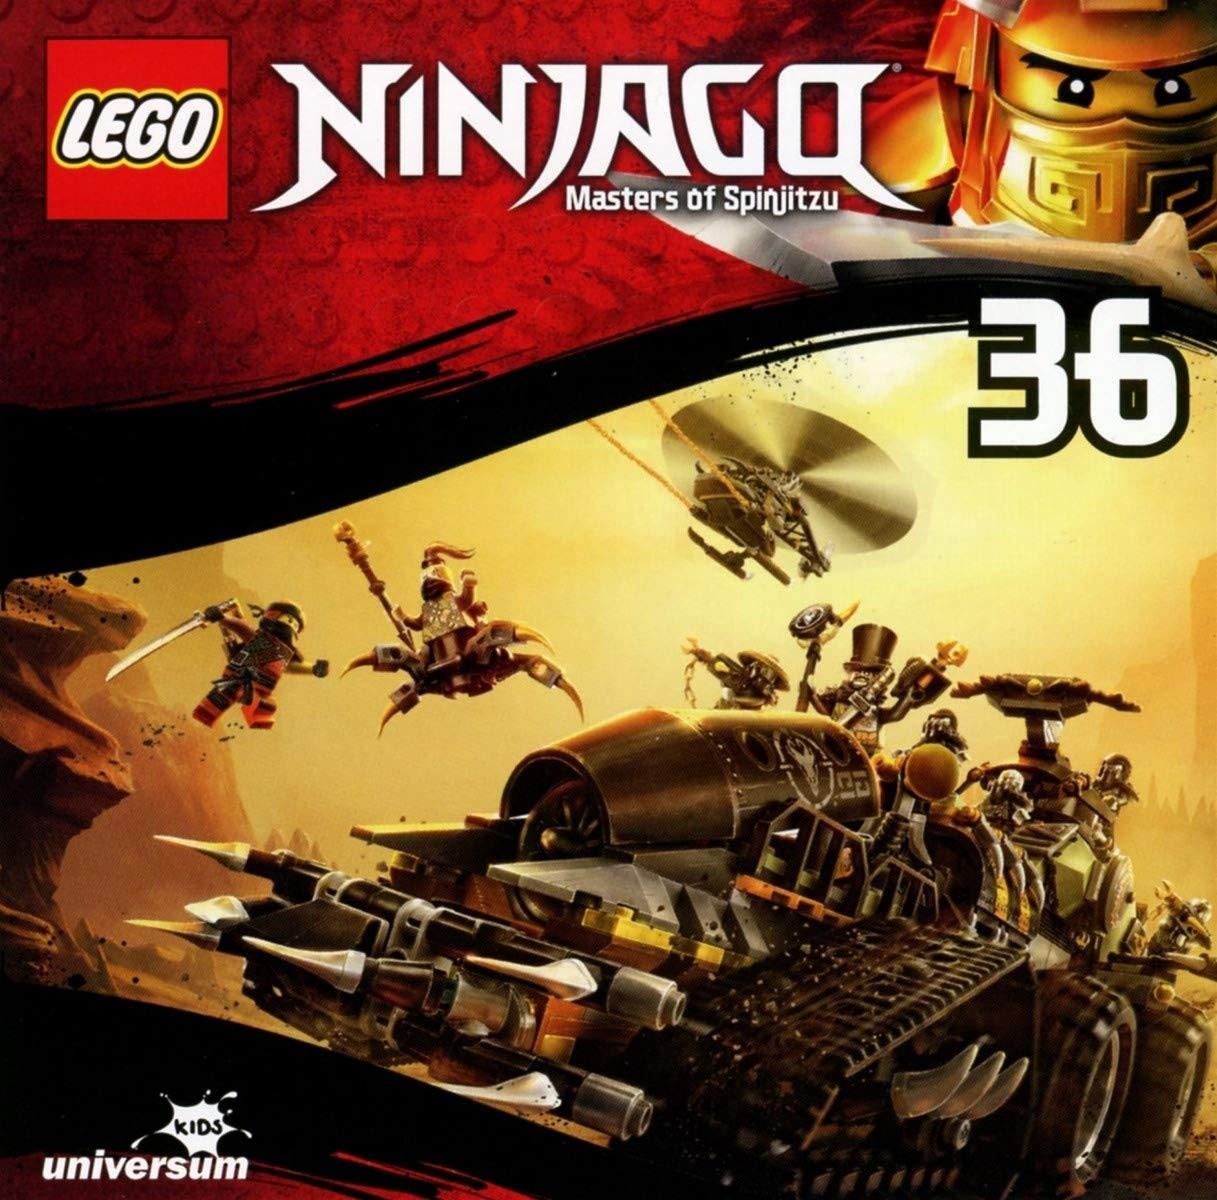 LEGO Ninjago 9. Staffel (CD 36)